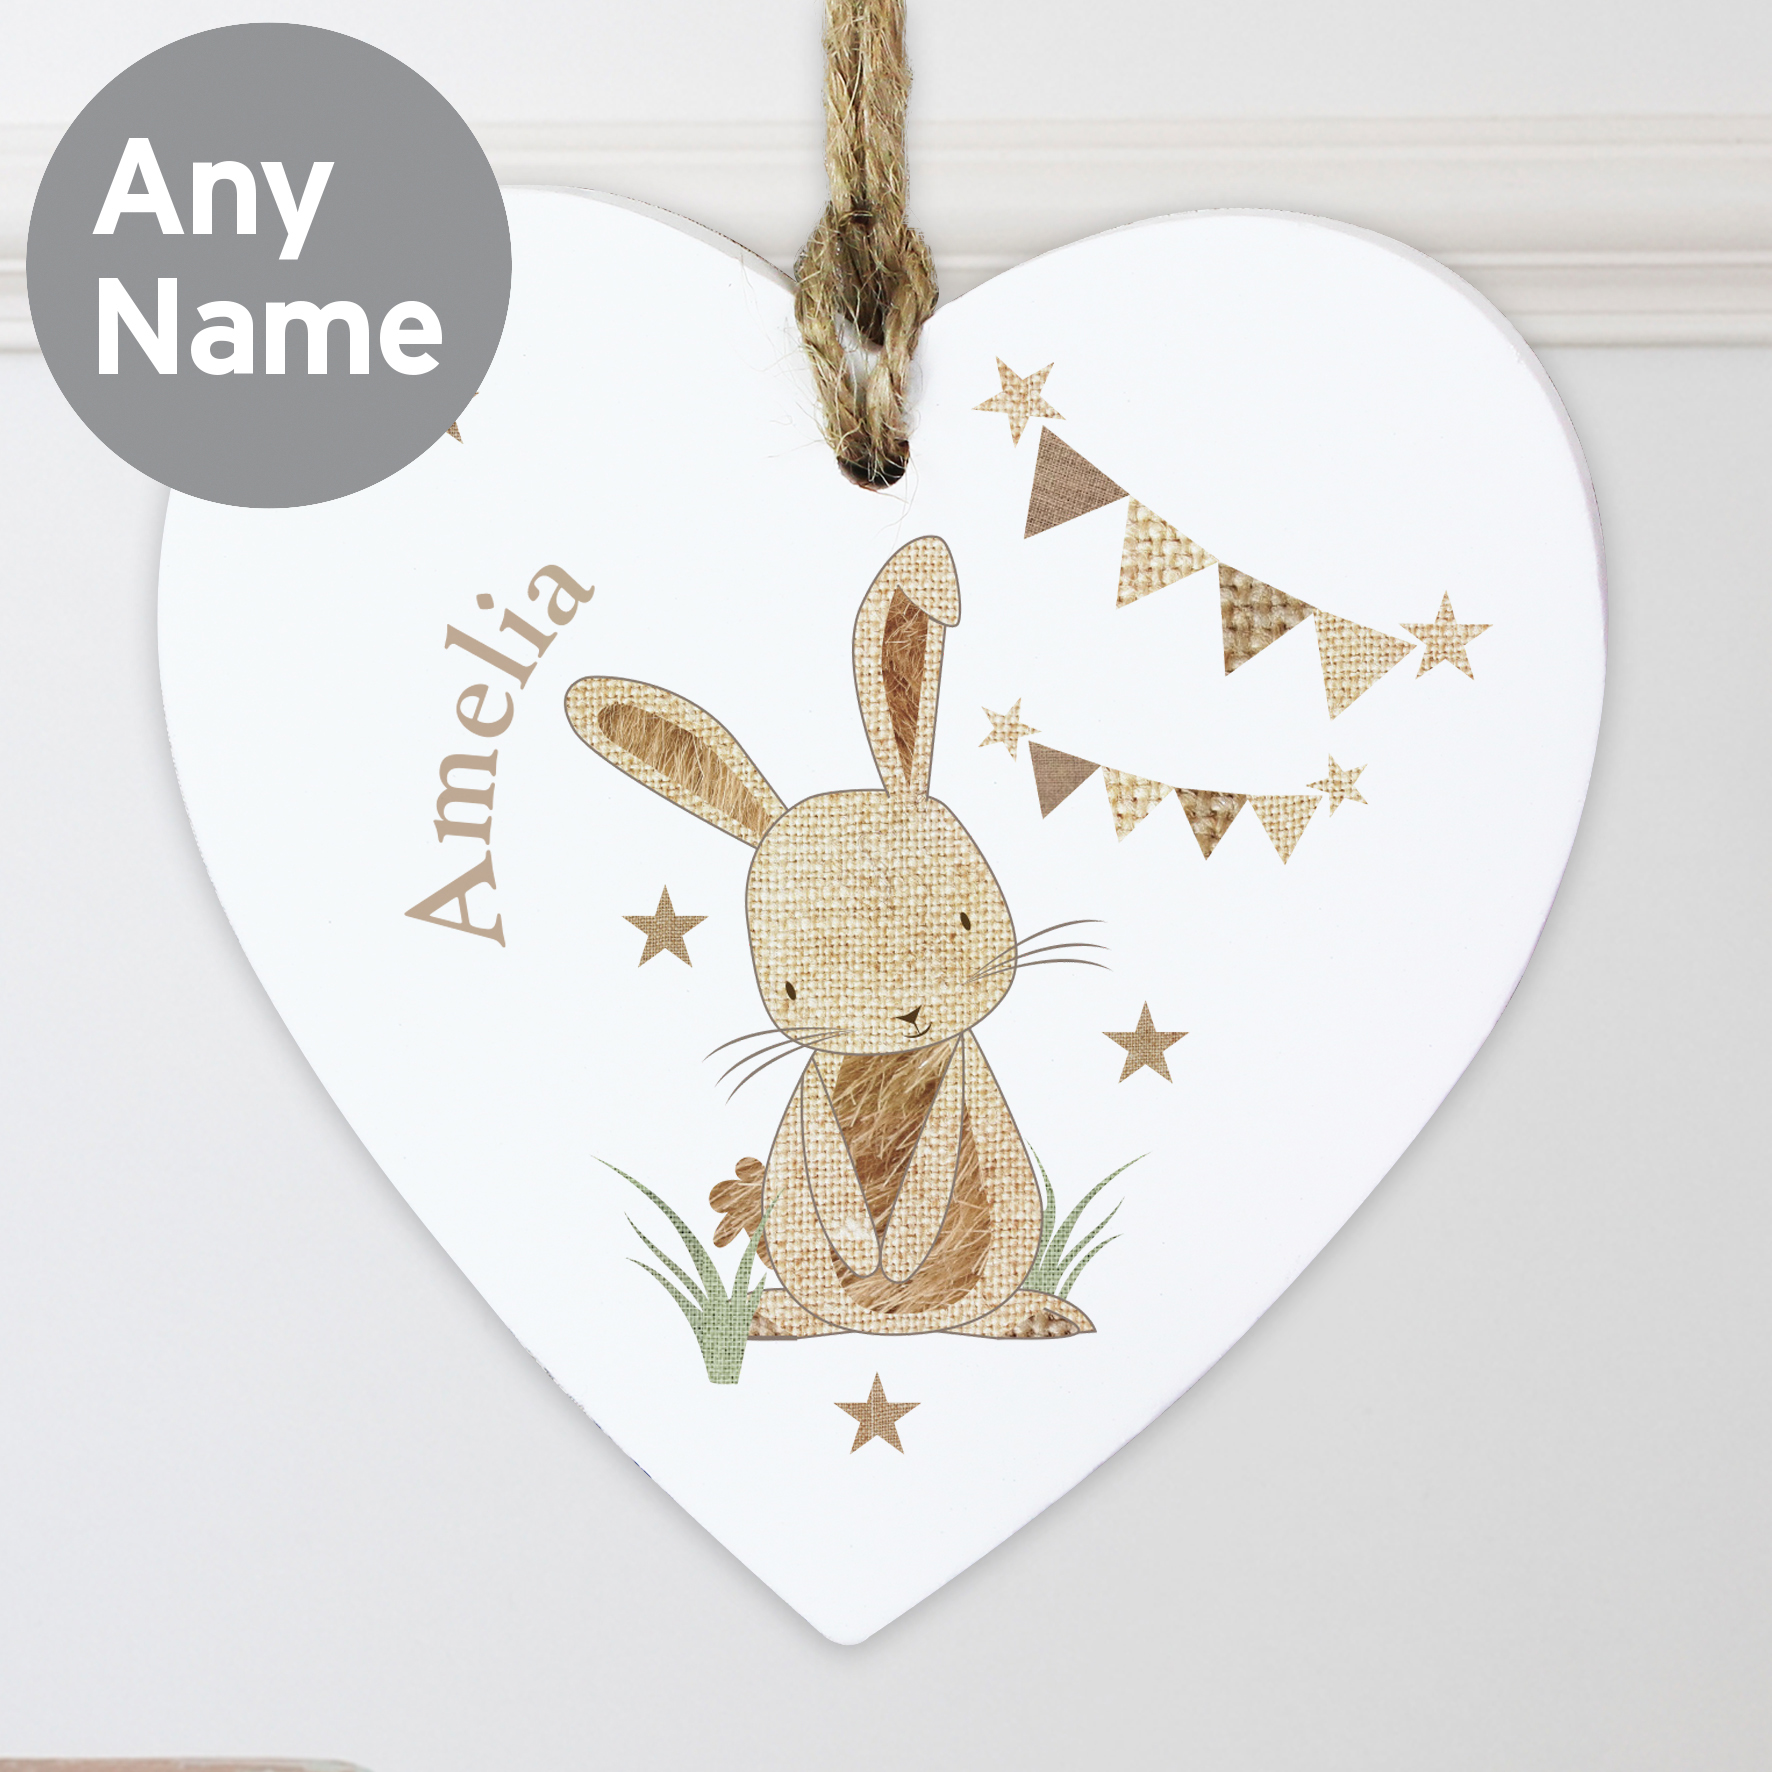 Personalised Hessian Rabbit Wooden Heart Decoration